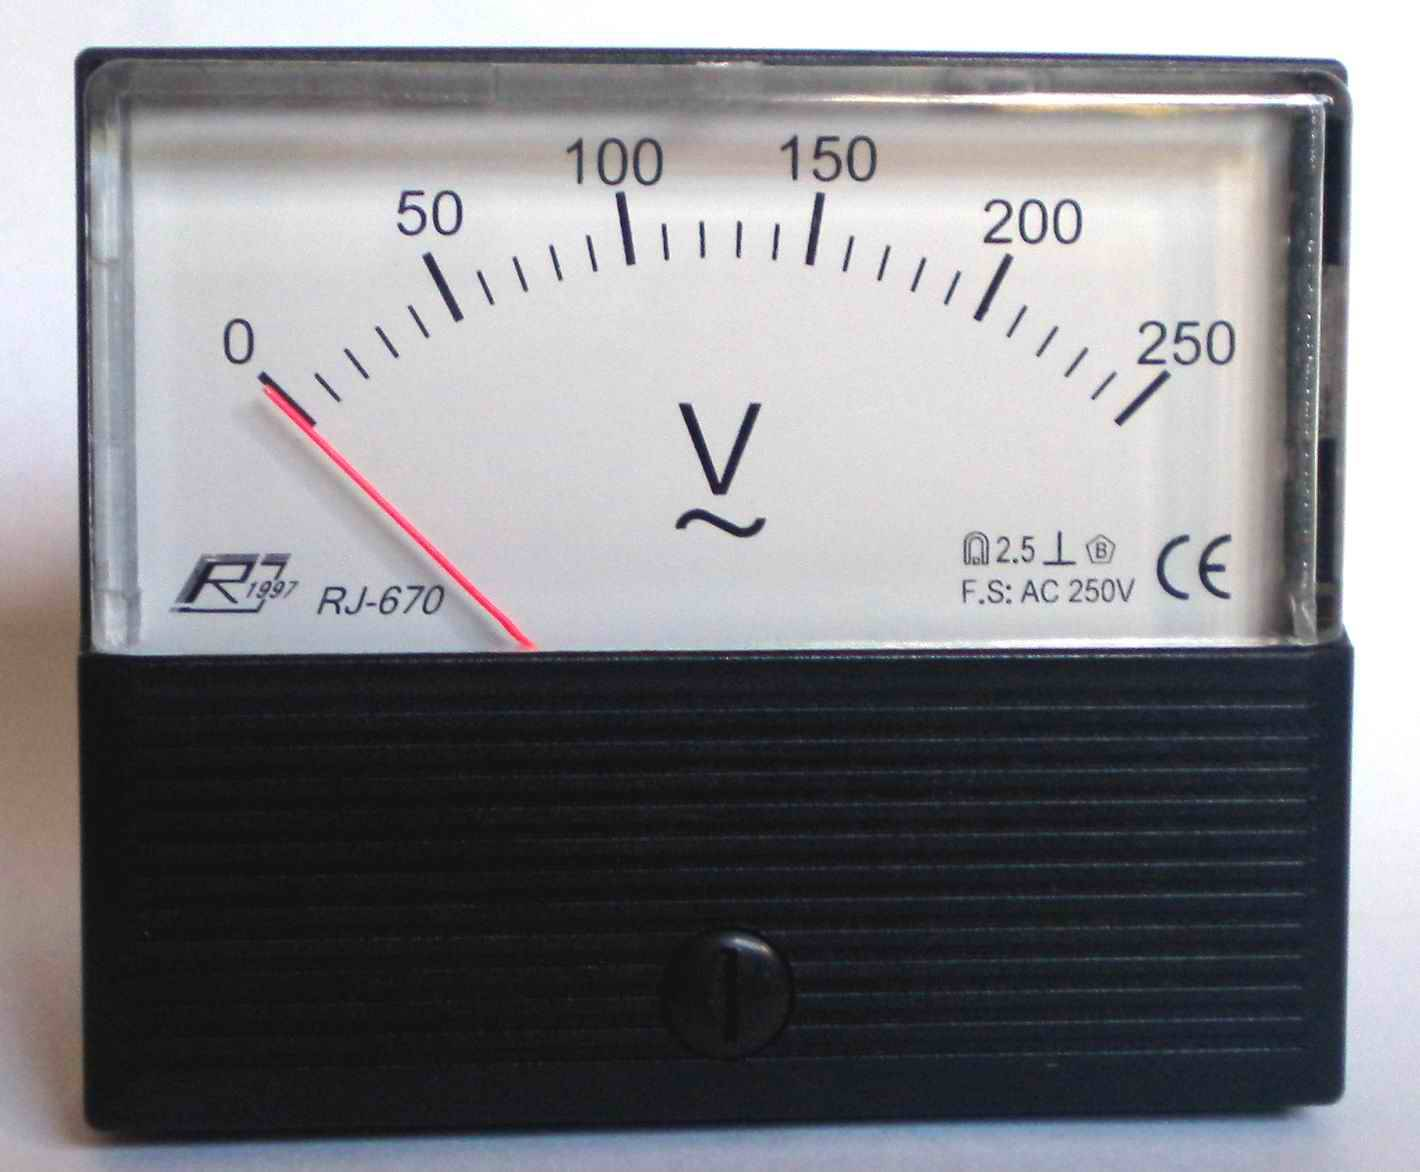 analog ammeter, voltmeter, Hz meter/moving iron, moving coil